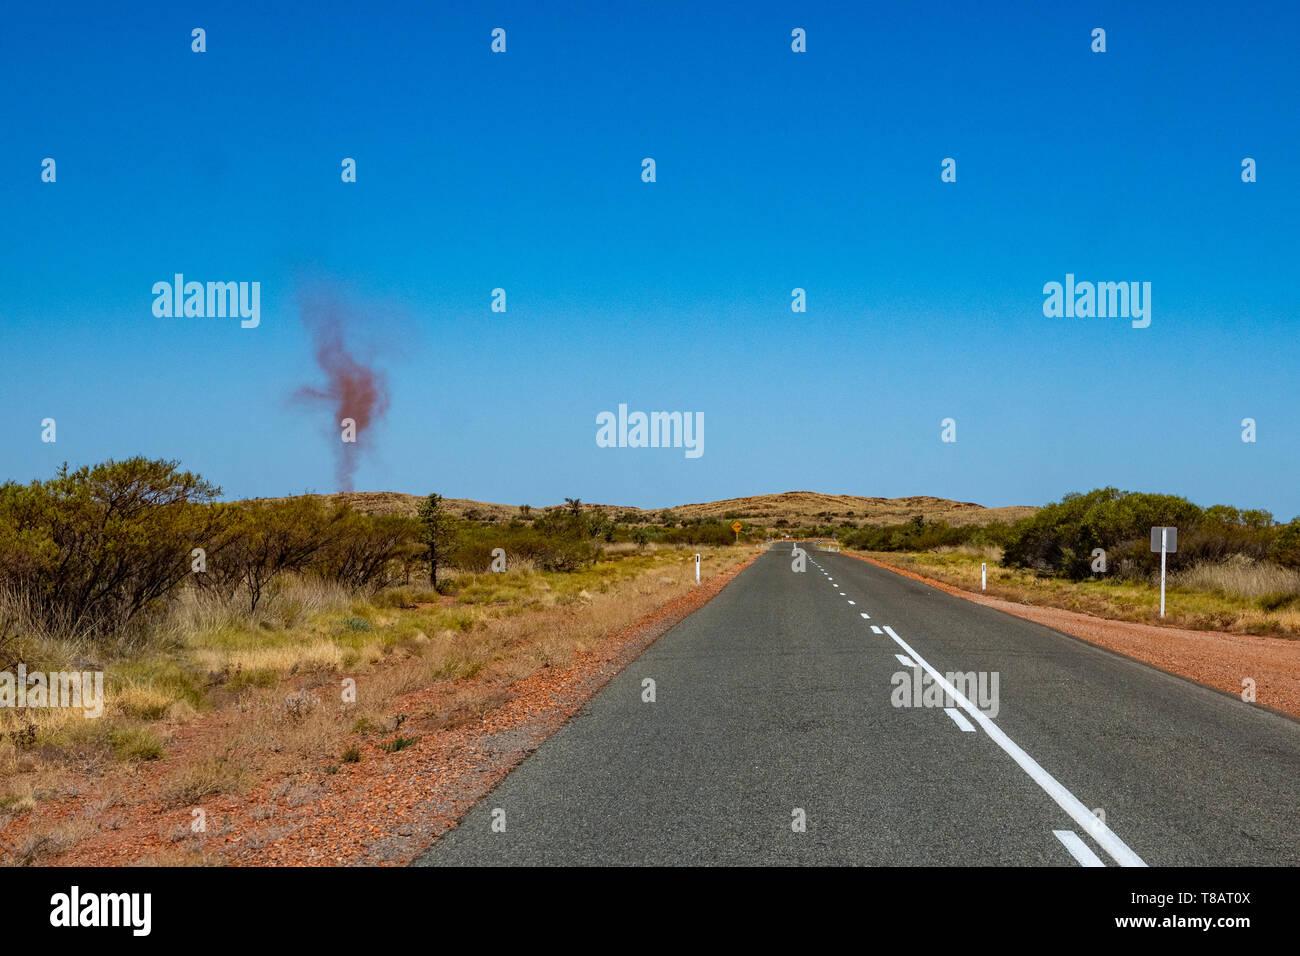 Dust devil besides dark road leading through red sanded Australian landscape towards Karijini National Park - Stock Image